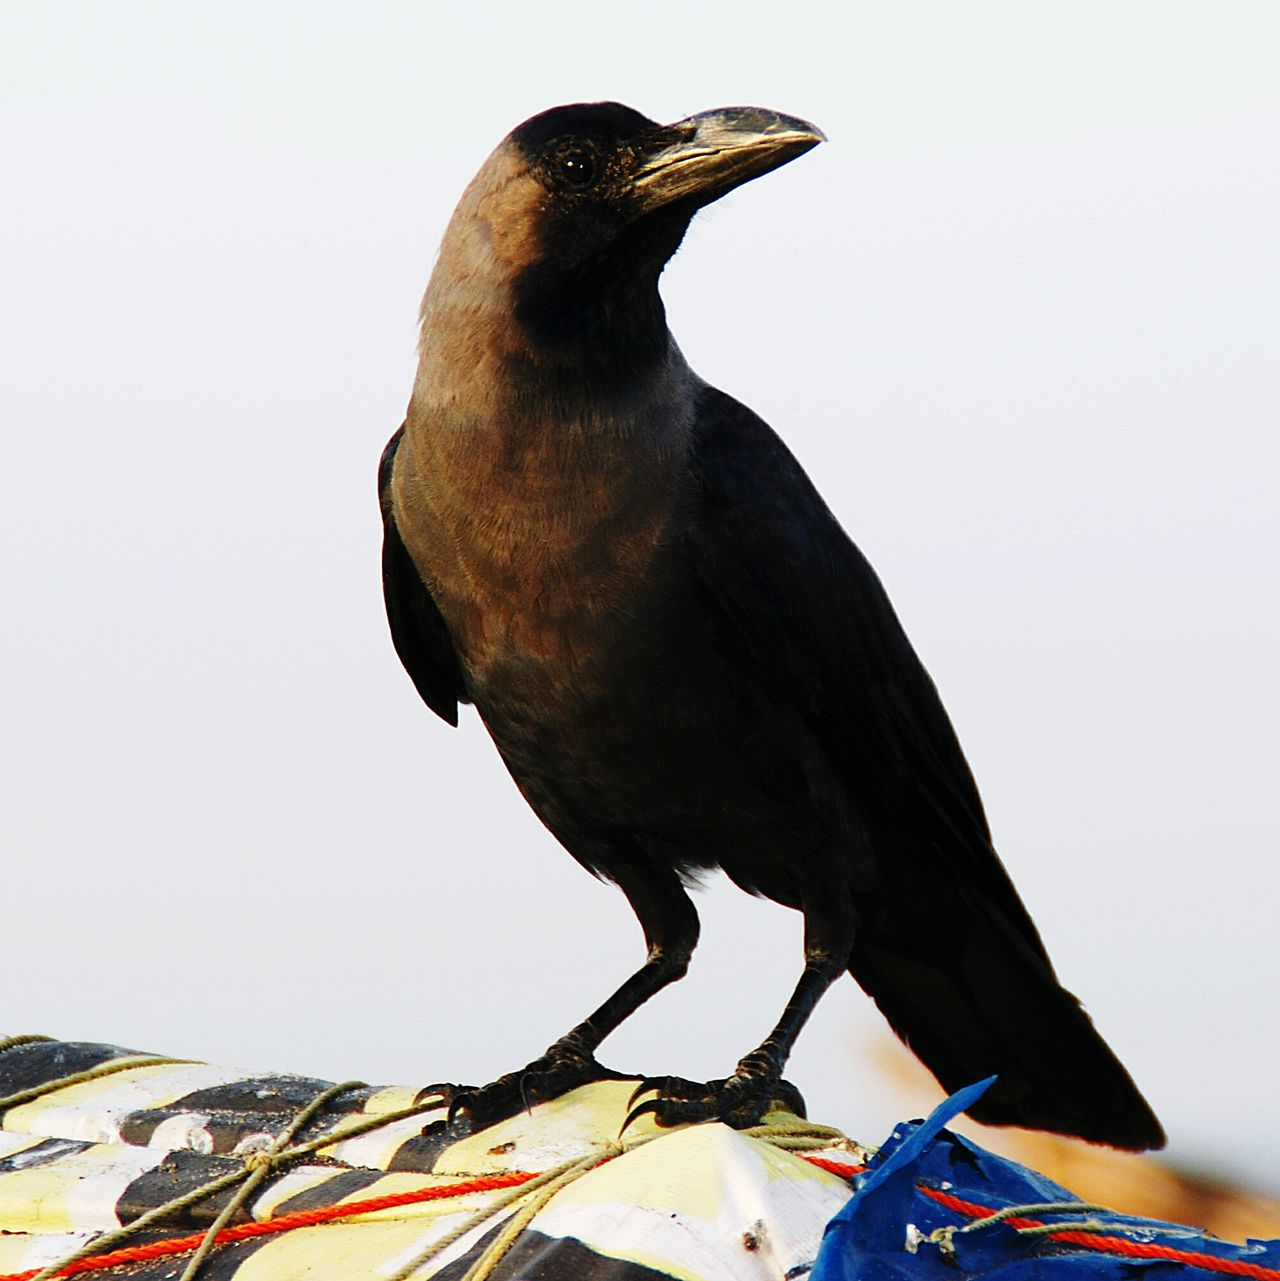 Krähe Kraehe Crow Vogel Bird Blackbird